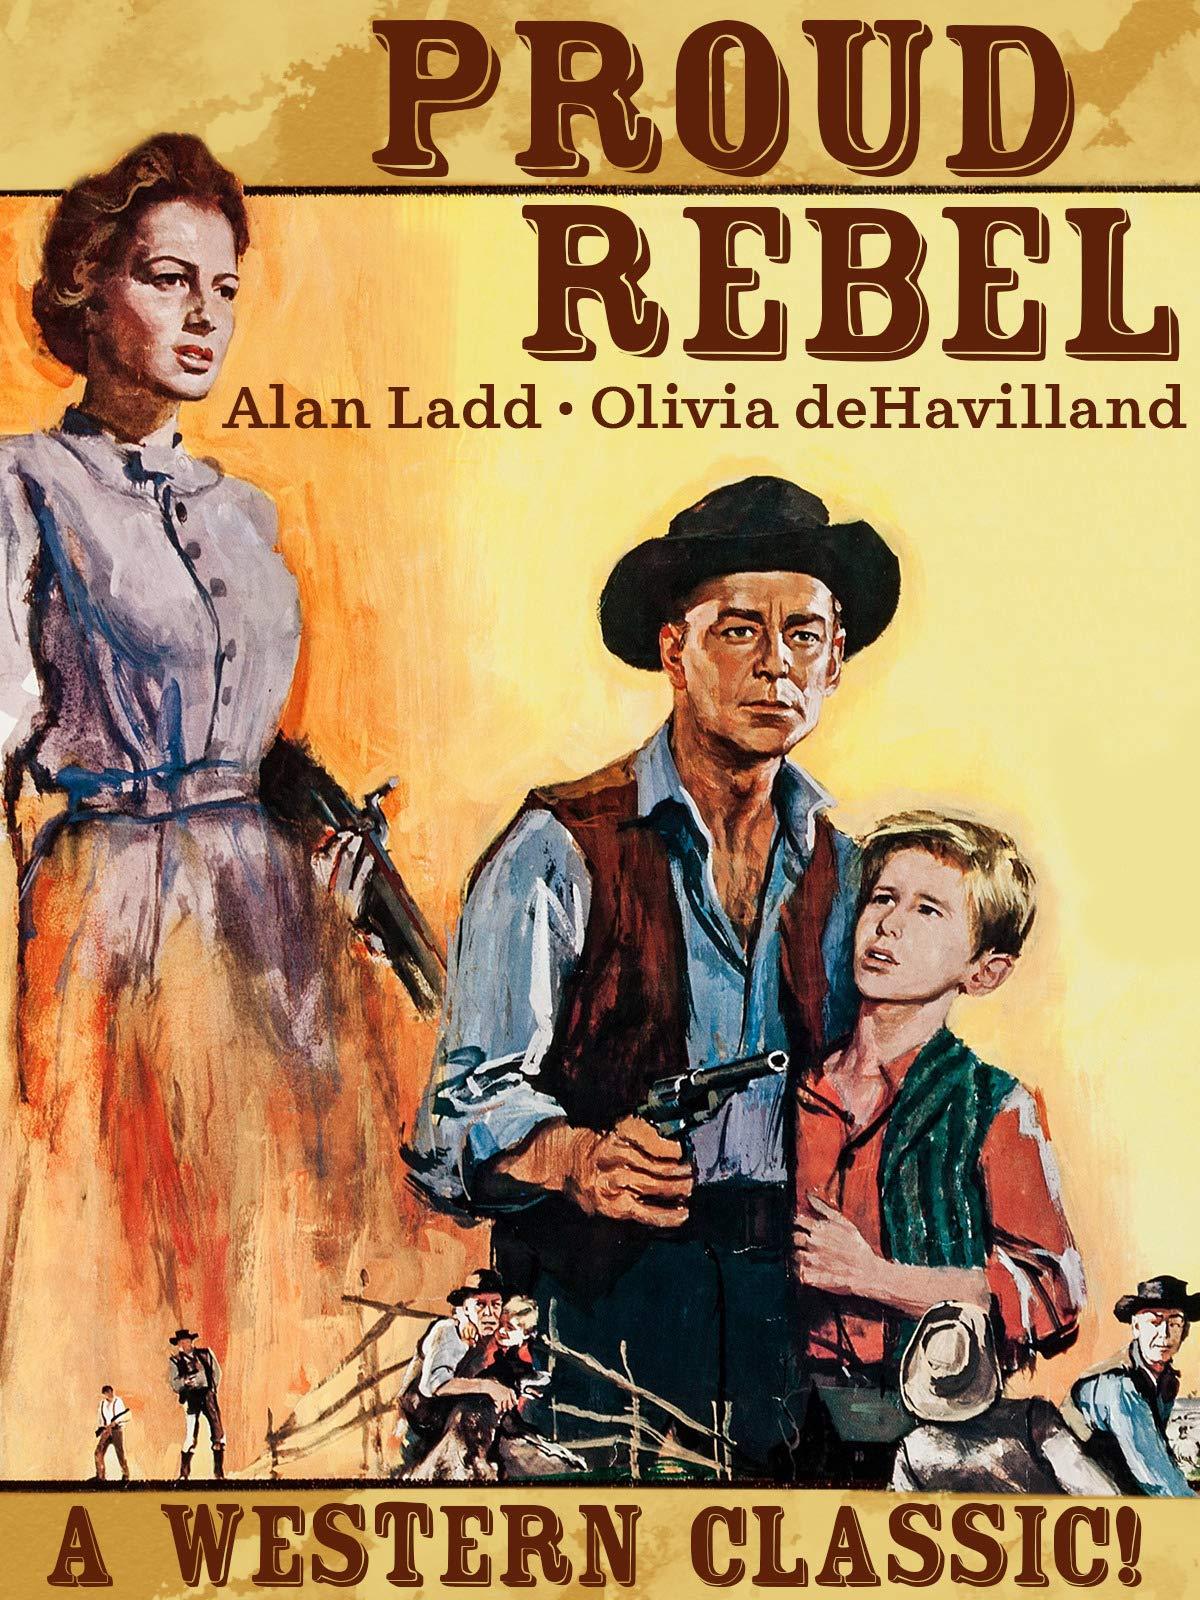 Proud Rebel - Alan Ladd, Olivia deHavilland, A Western Classic!